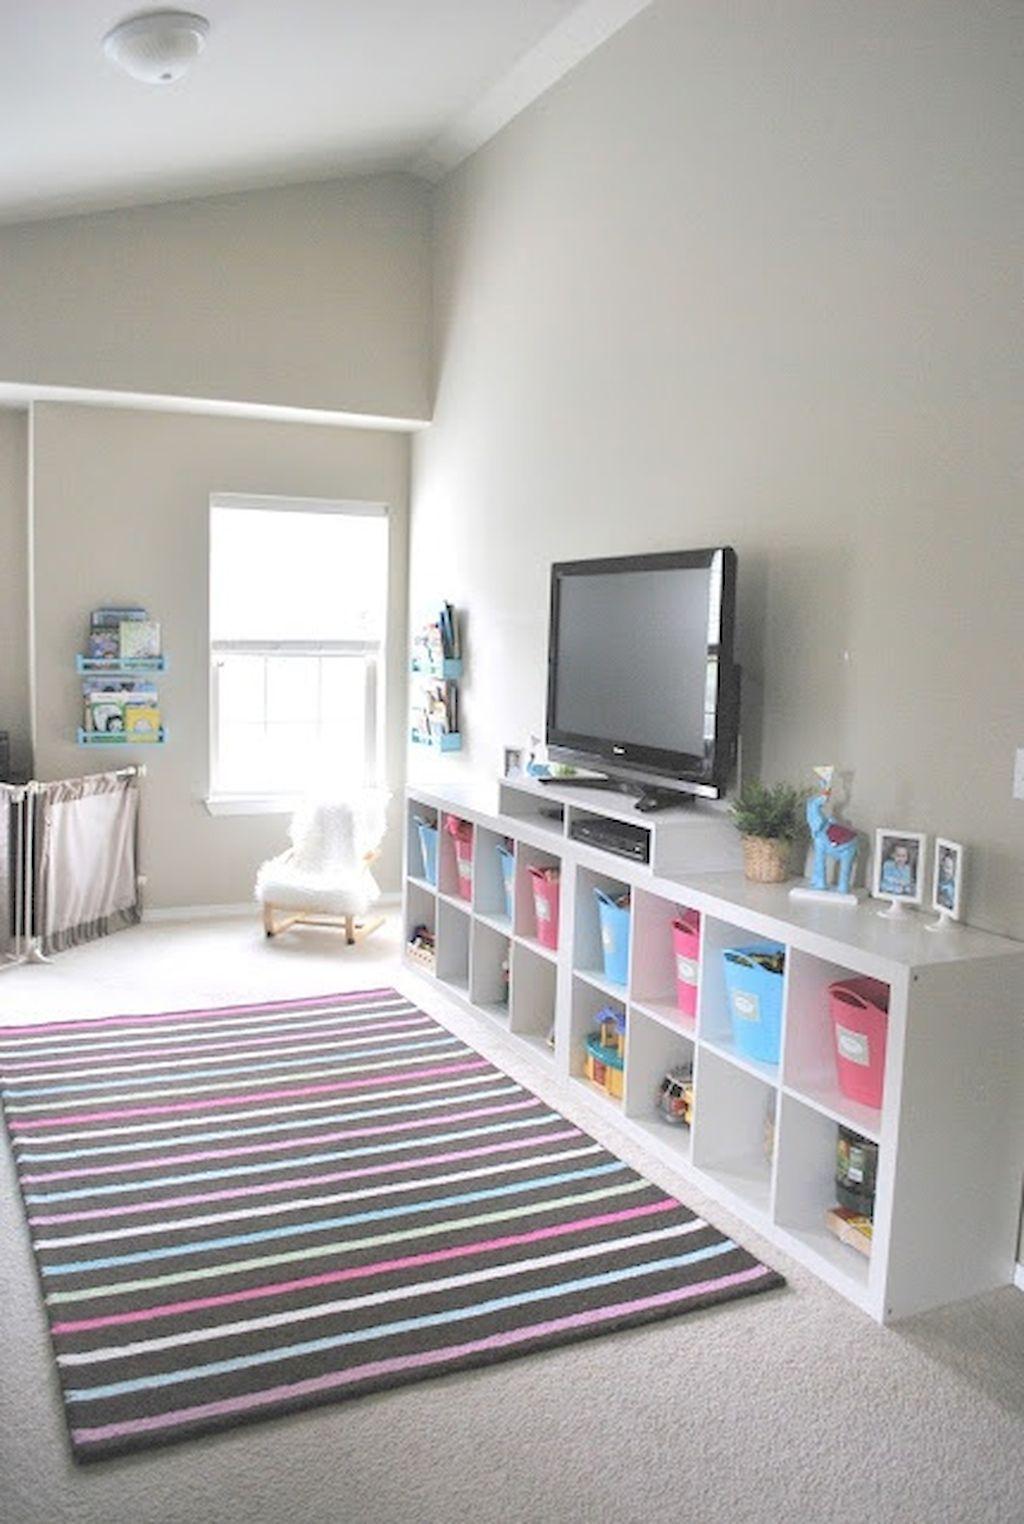 Home interior masterpiece figurines  insane beautiful kids playroom design u decor ideas  kid